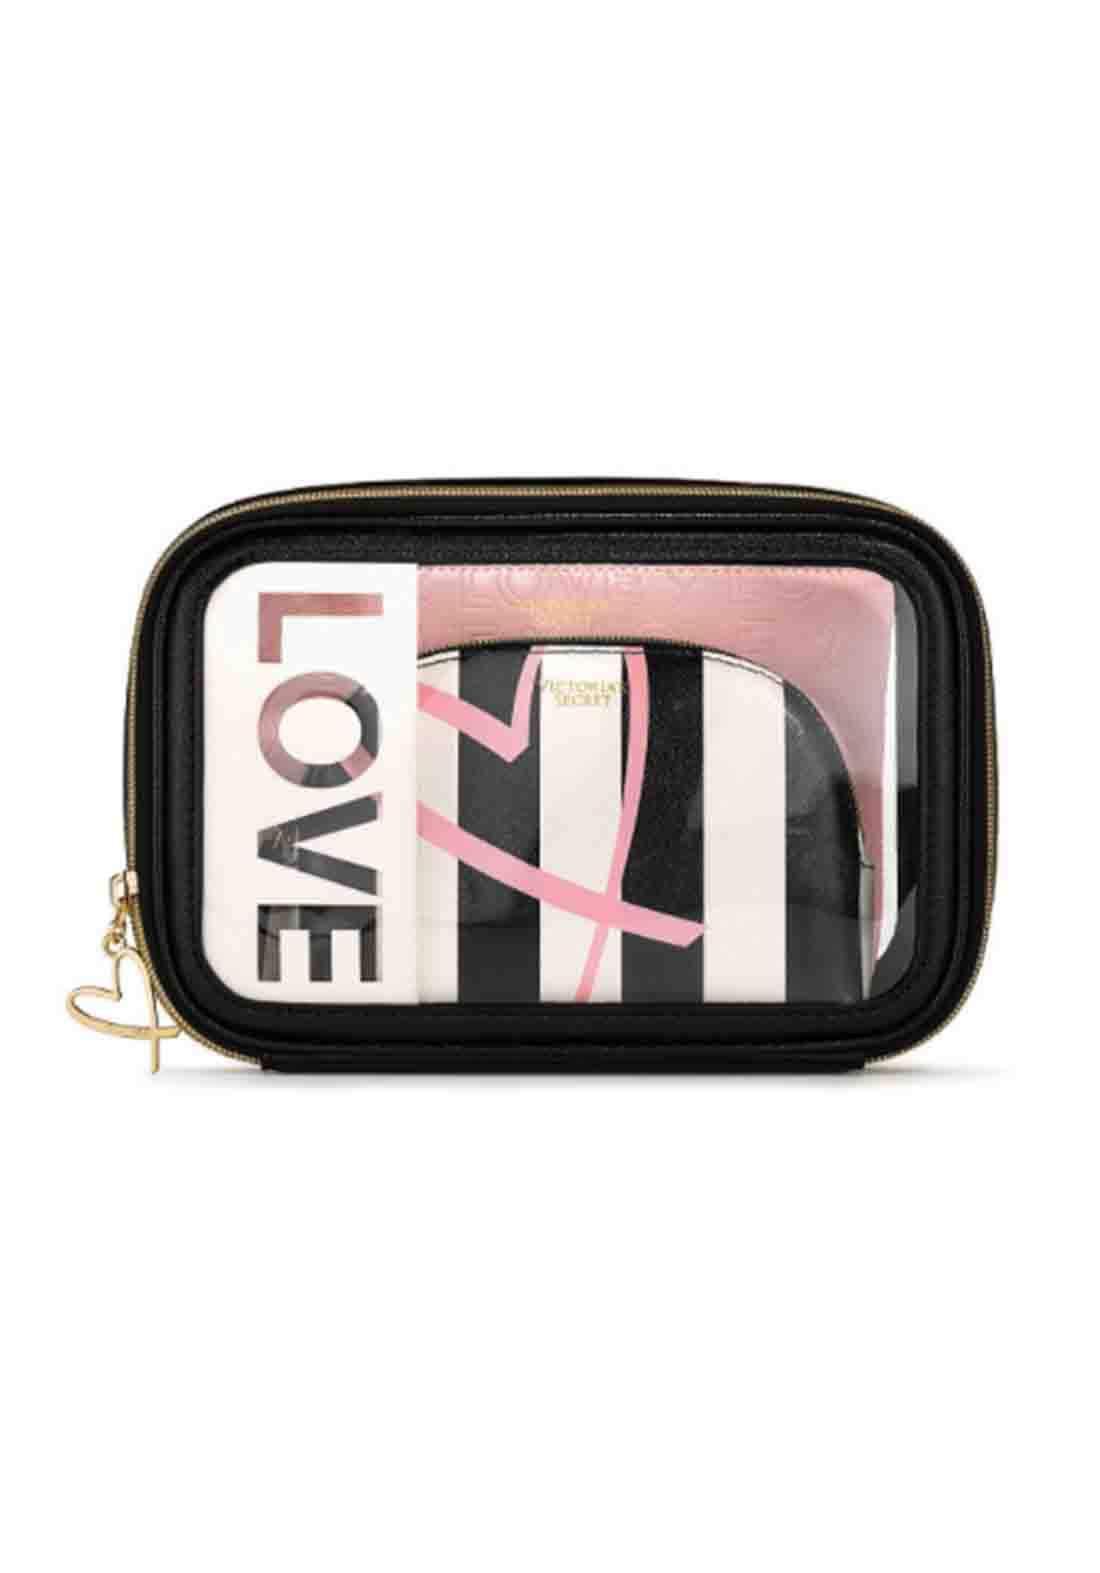 Victoria's Secret Cosmetic Bag 3pcs  حقيبة مكياج